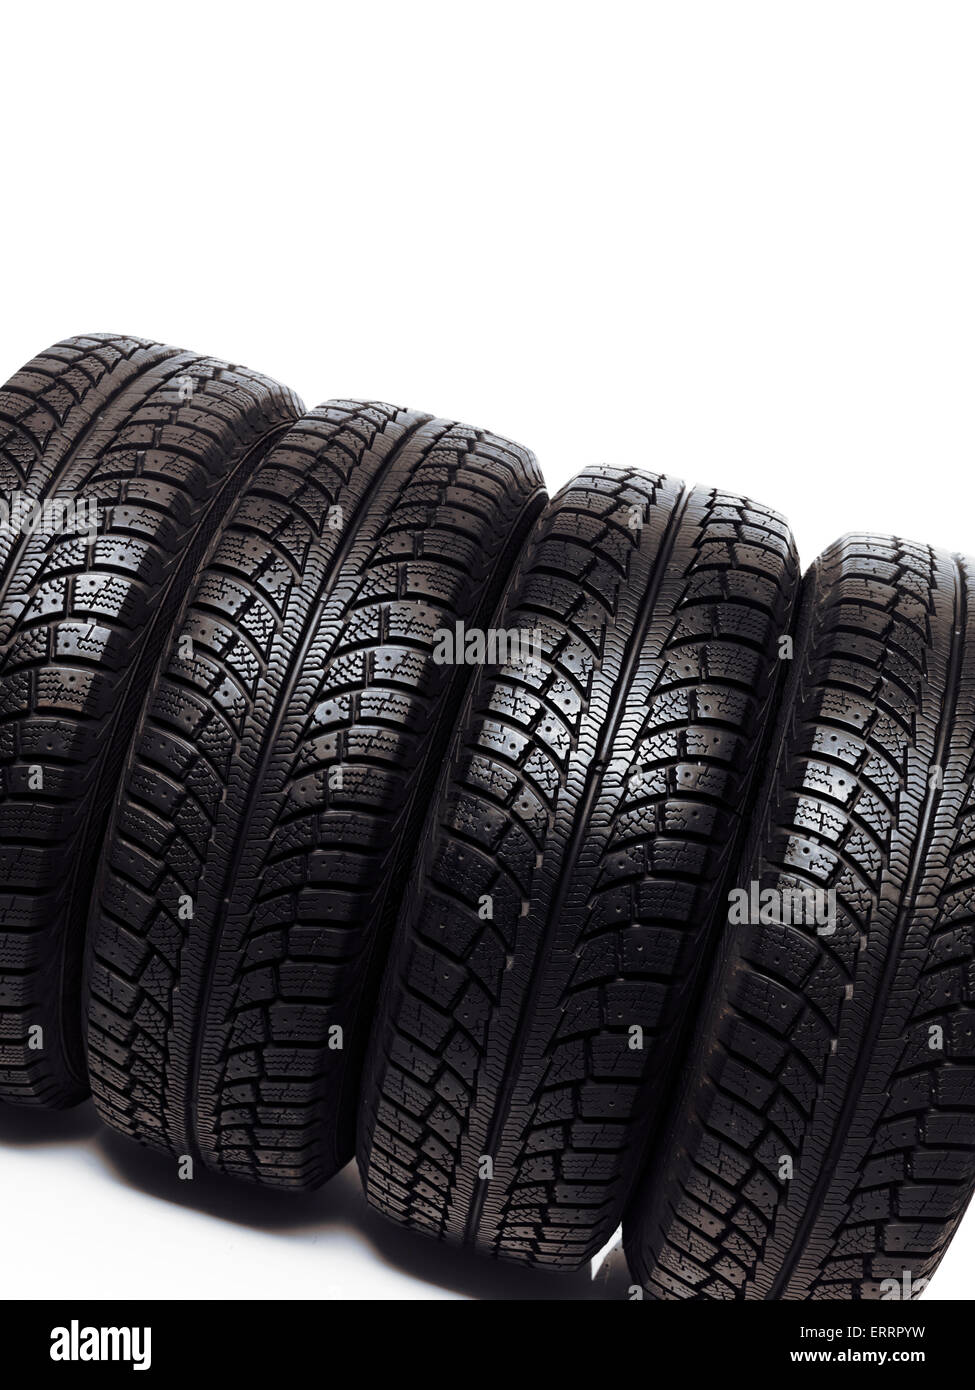 Set di pneumatici invernali, gli pneumatici da neve isolati su sfondo bianco Immagini Stock